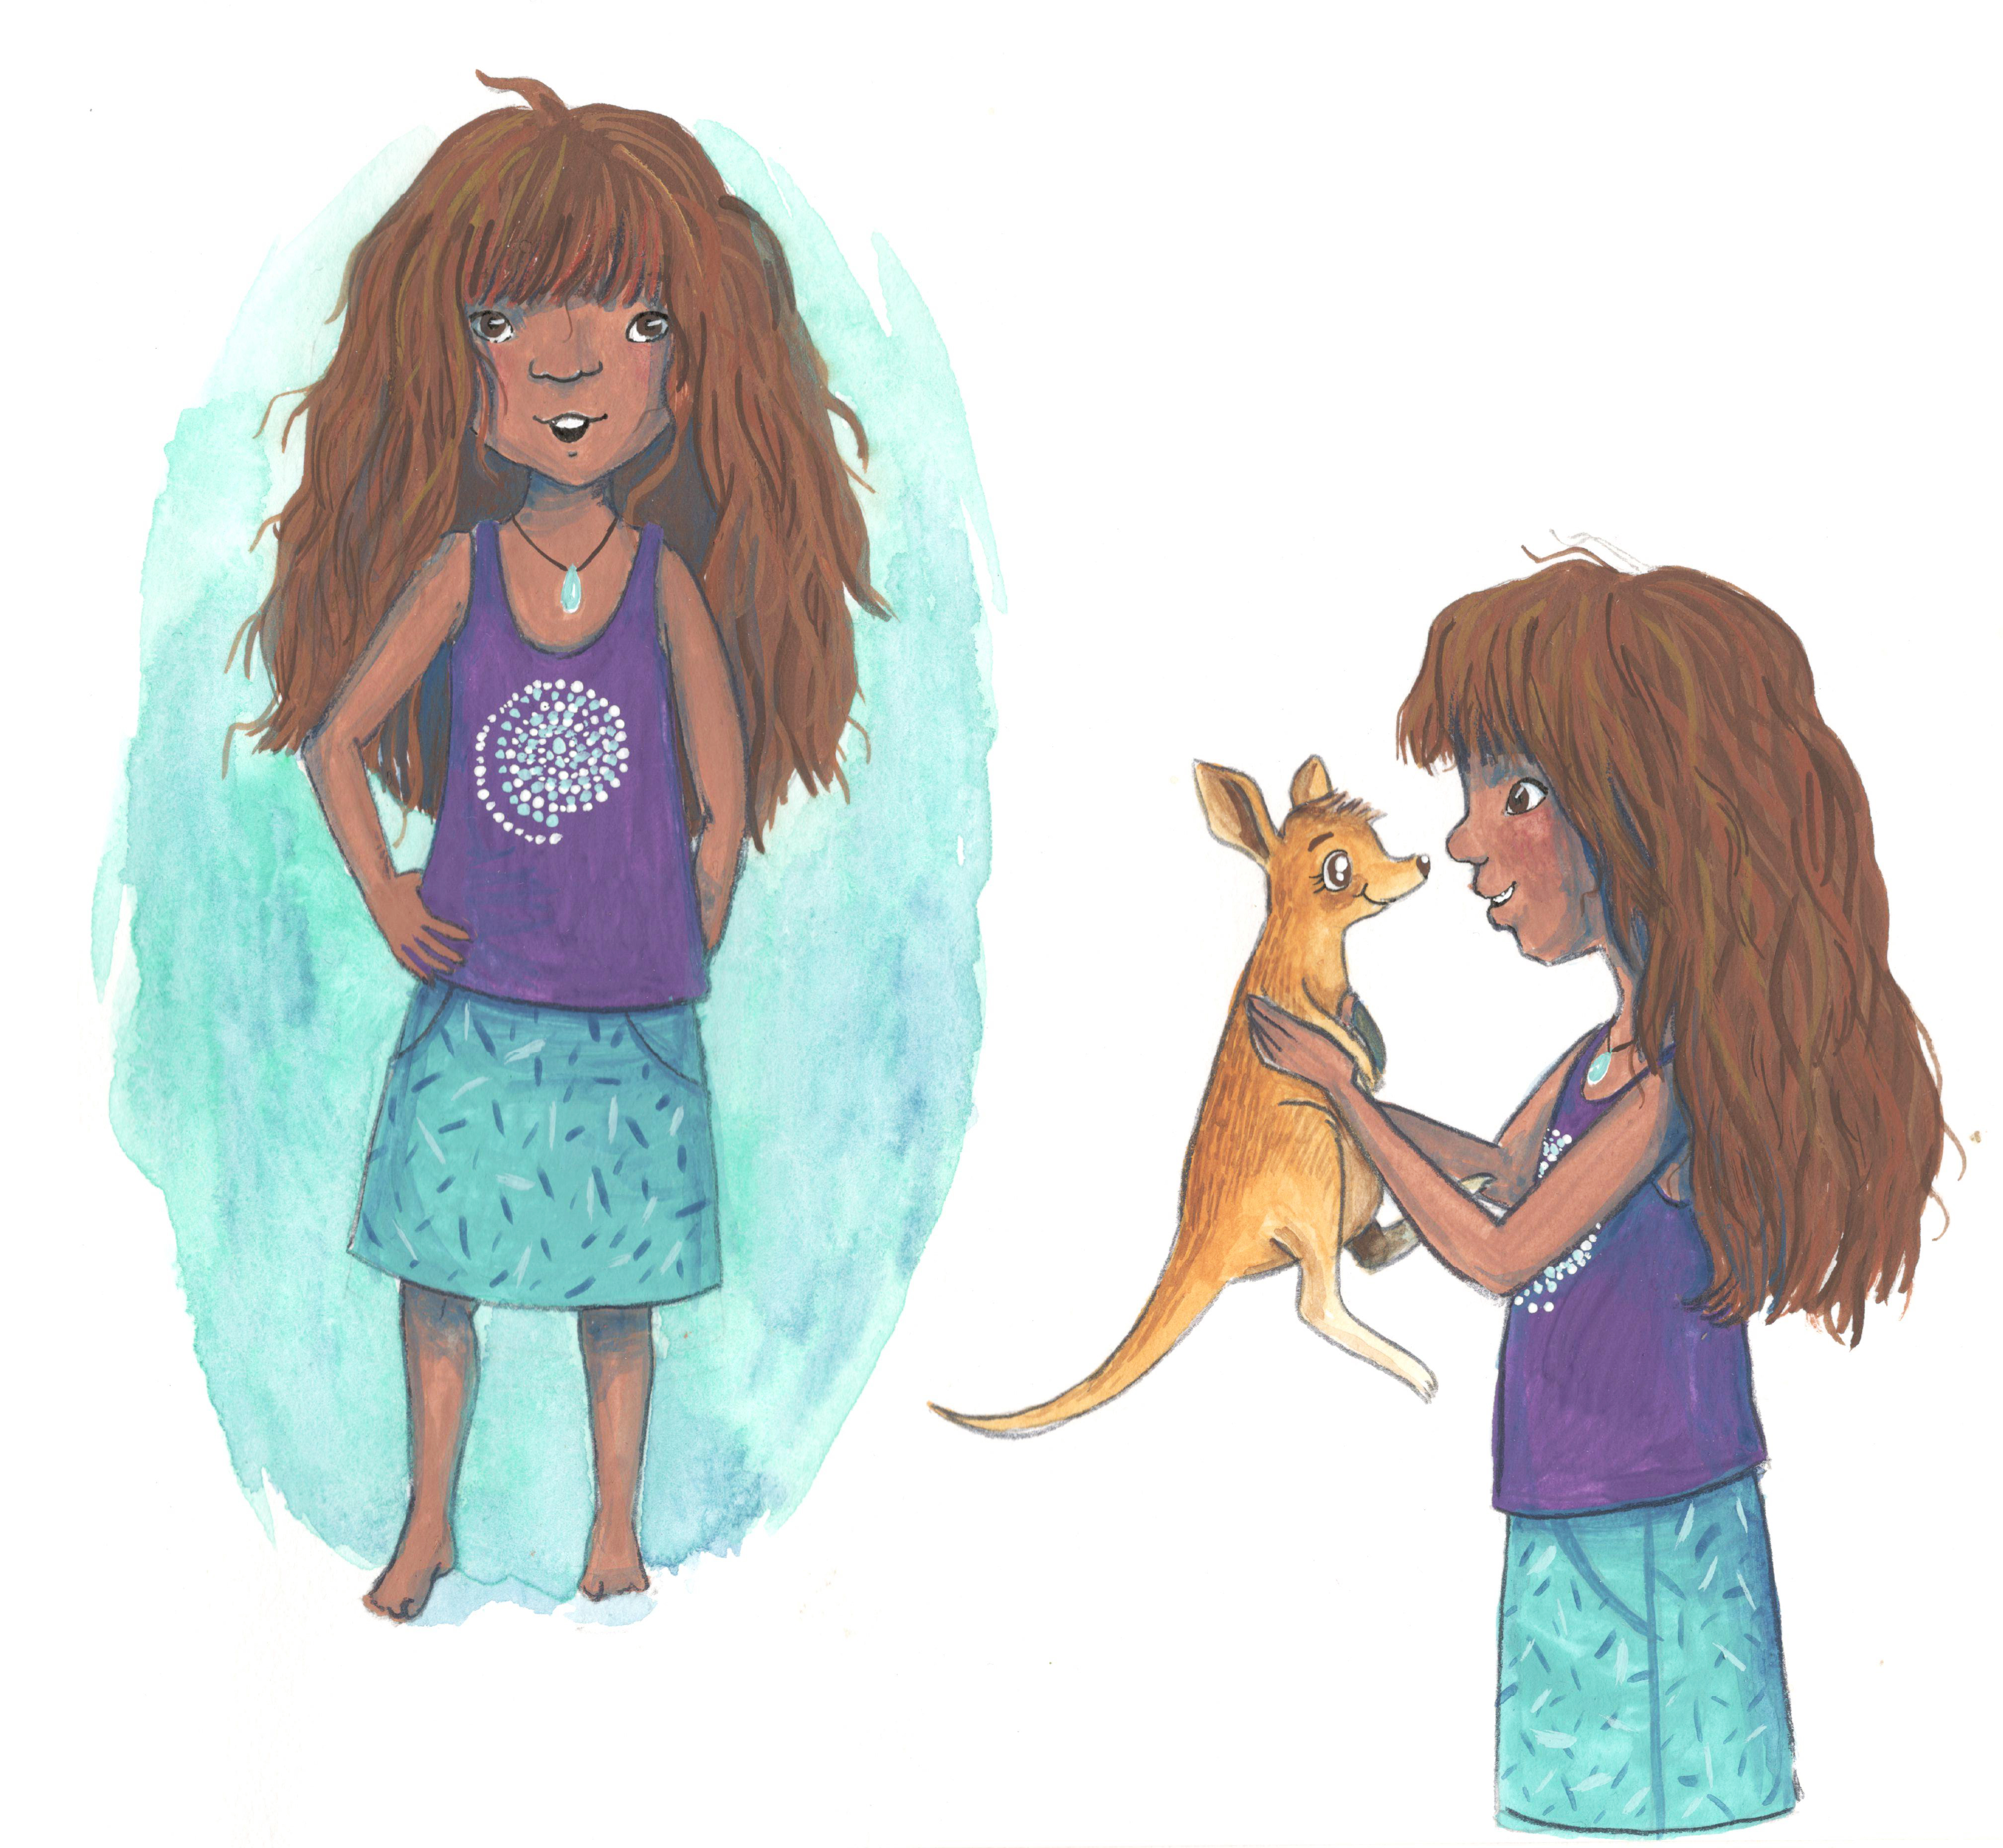 Gouache, Gouachelillustration, Simone Rose Illustration, Kinder, Kinderbuchillustration, Kinderbuch, Bilderbuch, Illustratorin, Australien, Aborigene, Känguruh